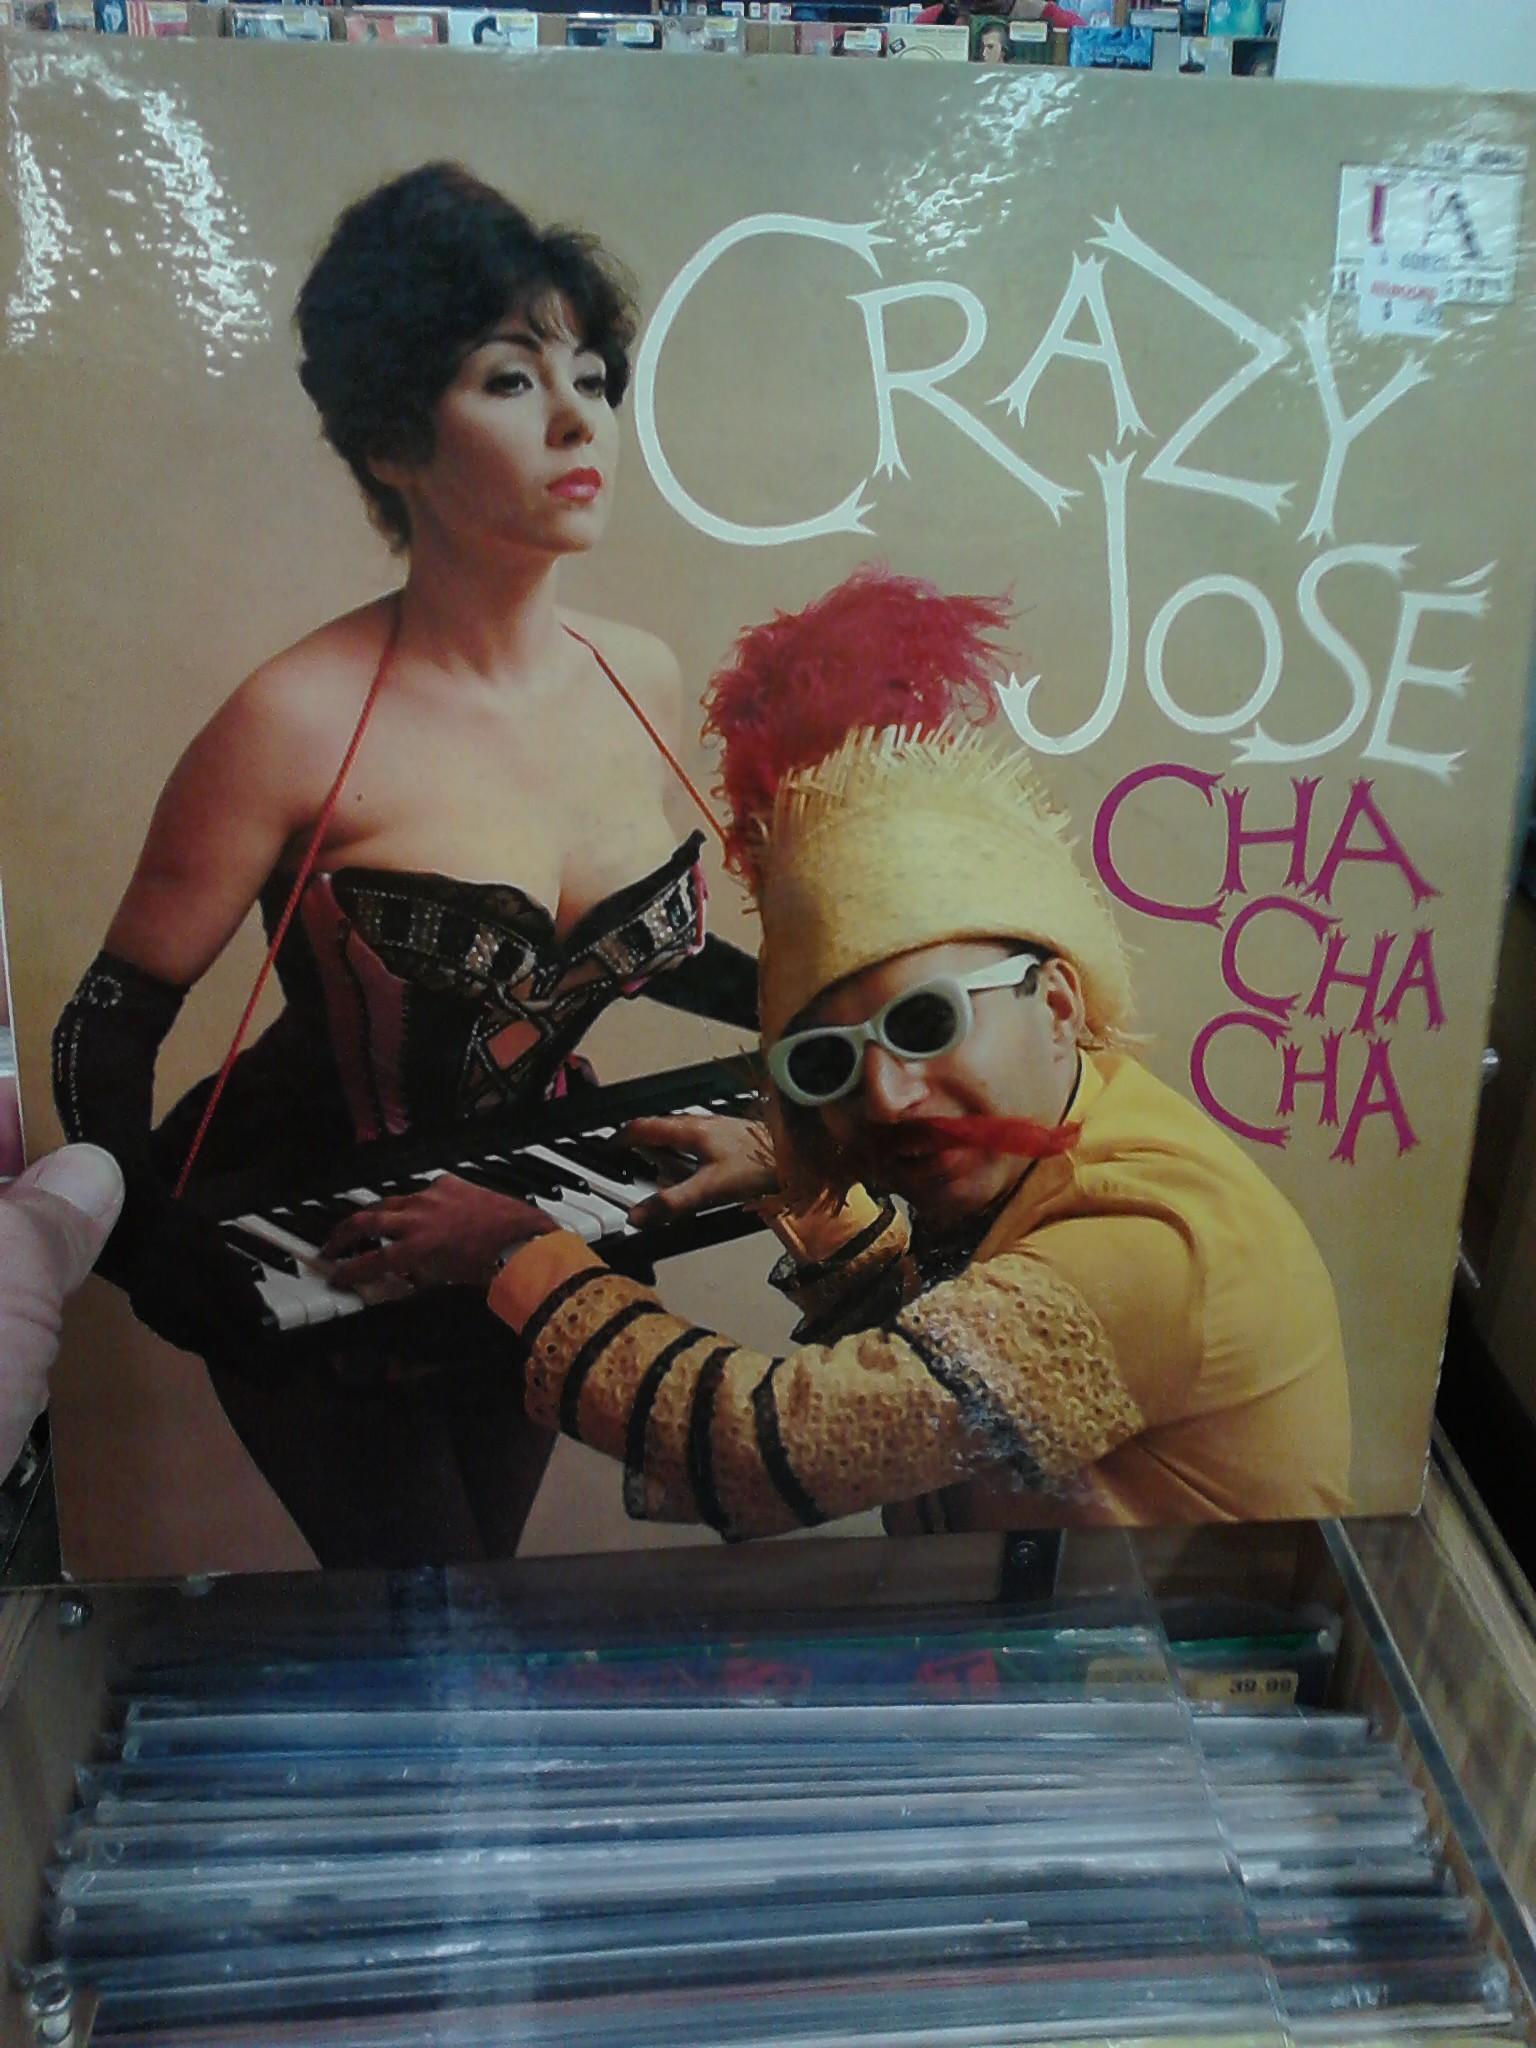 Crazy-Jose.jpg